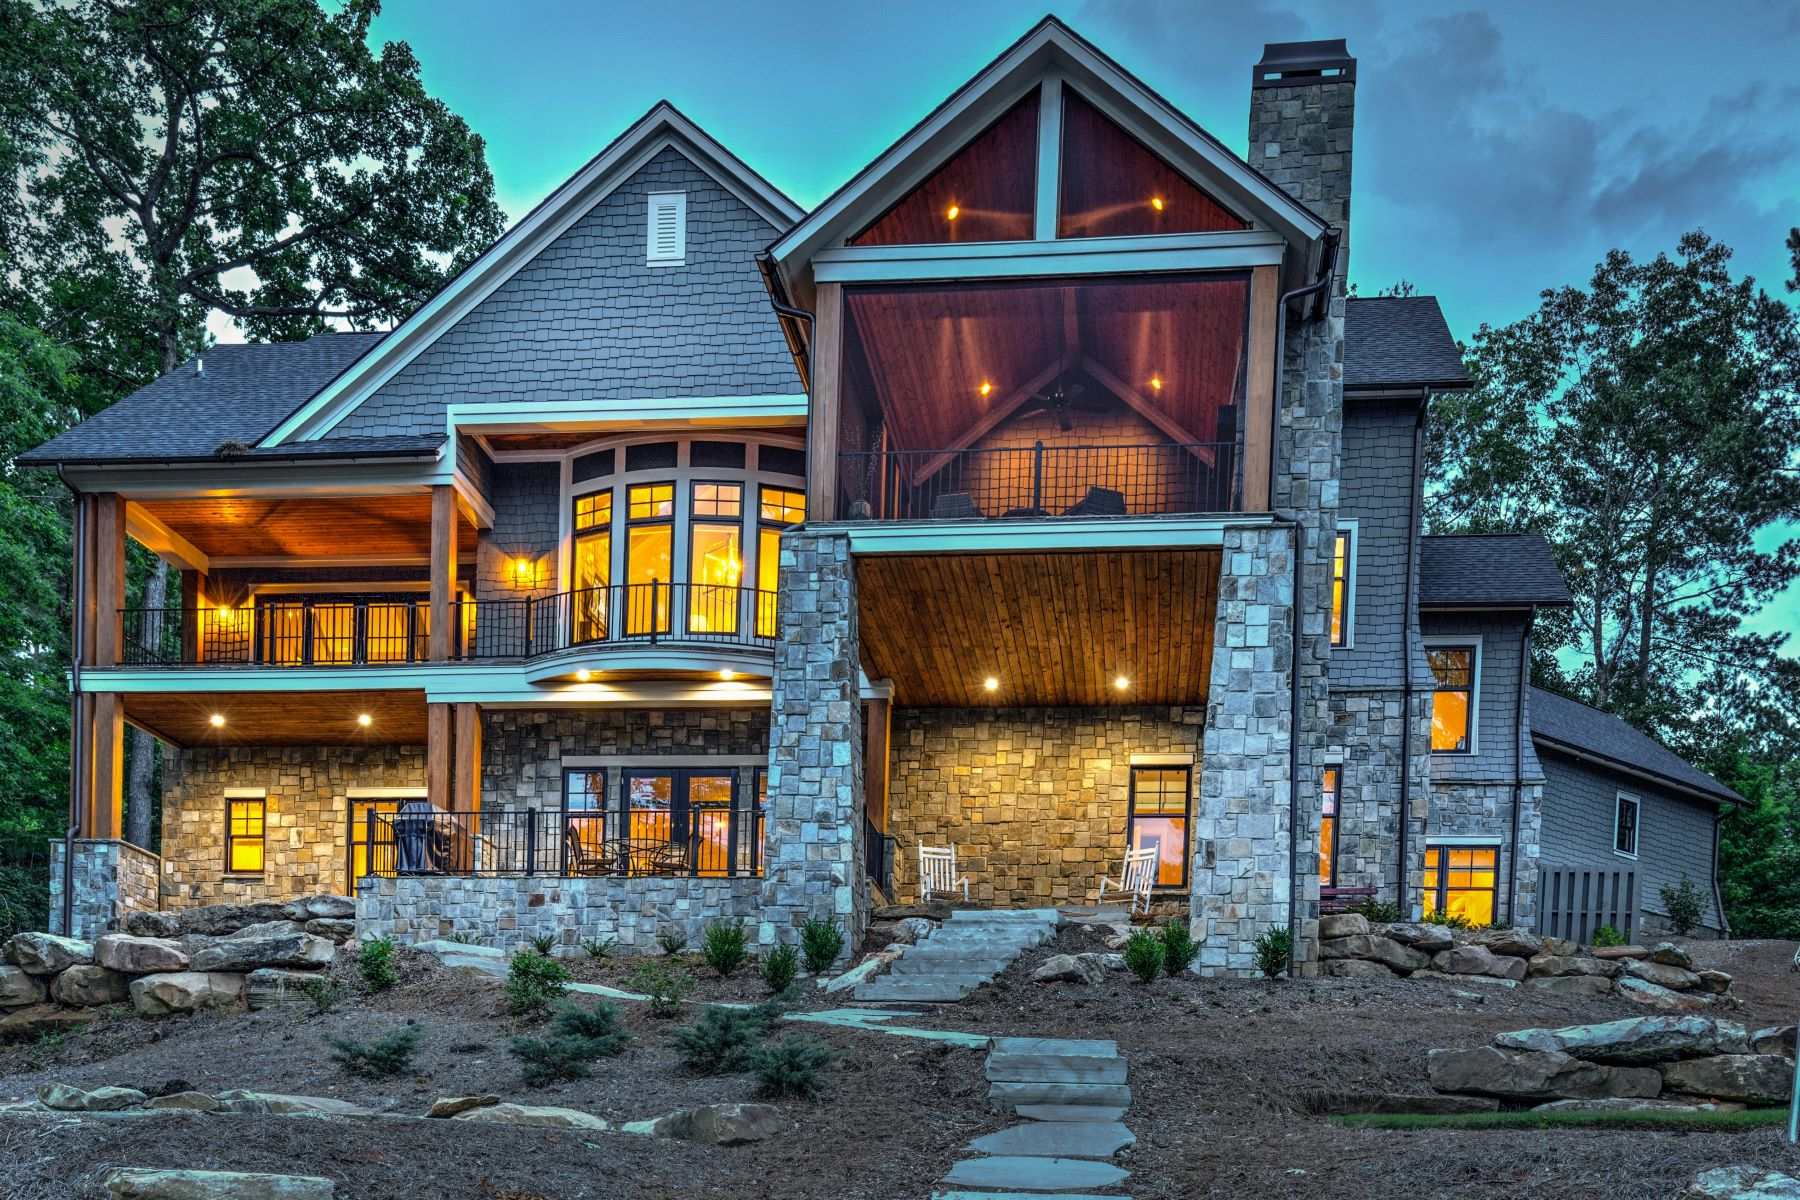 Single Family Homes for Active at Wonderful Lake Residence 188 Hickory Springs Way Six Mile, South Carolina 29682 United States